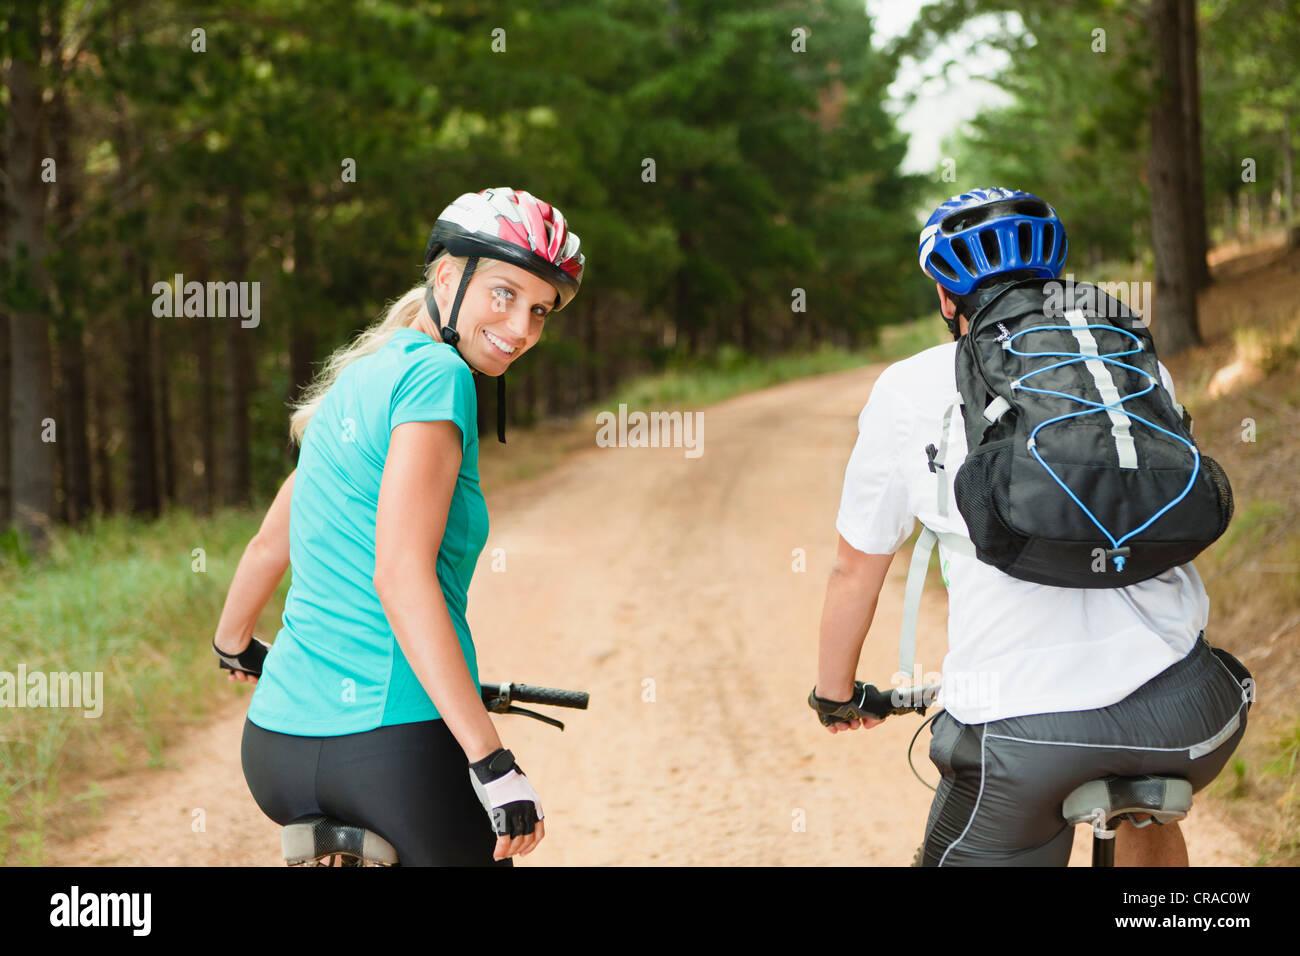 Couple mountain biking on dirt road - Stock Image